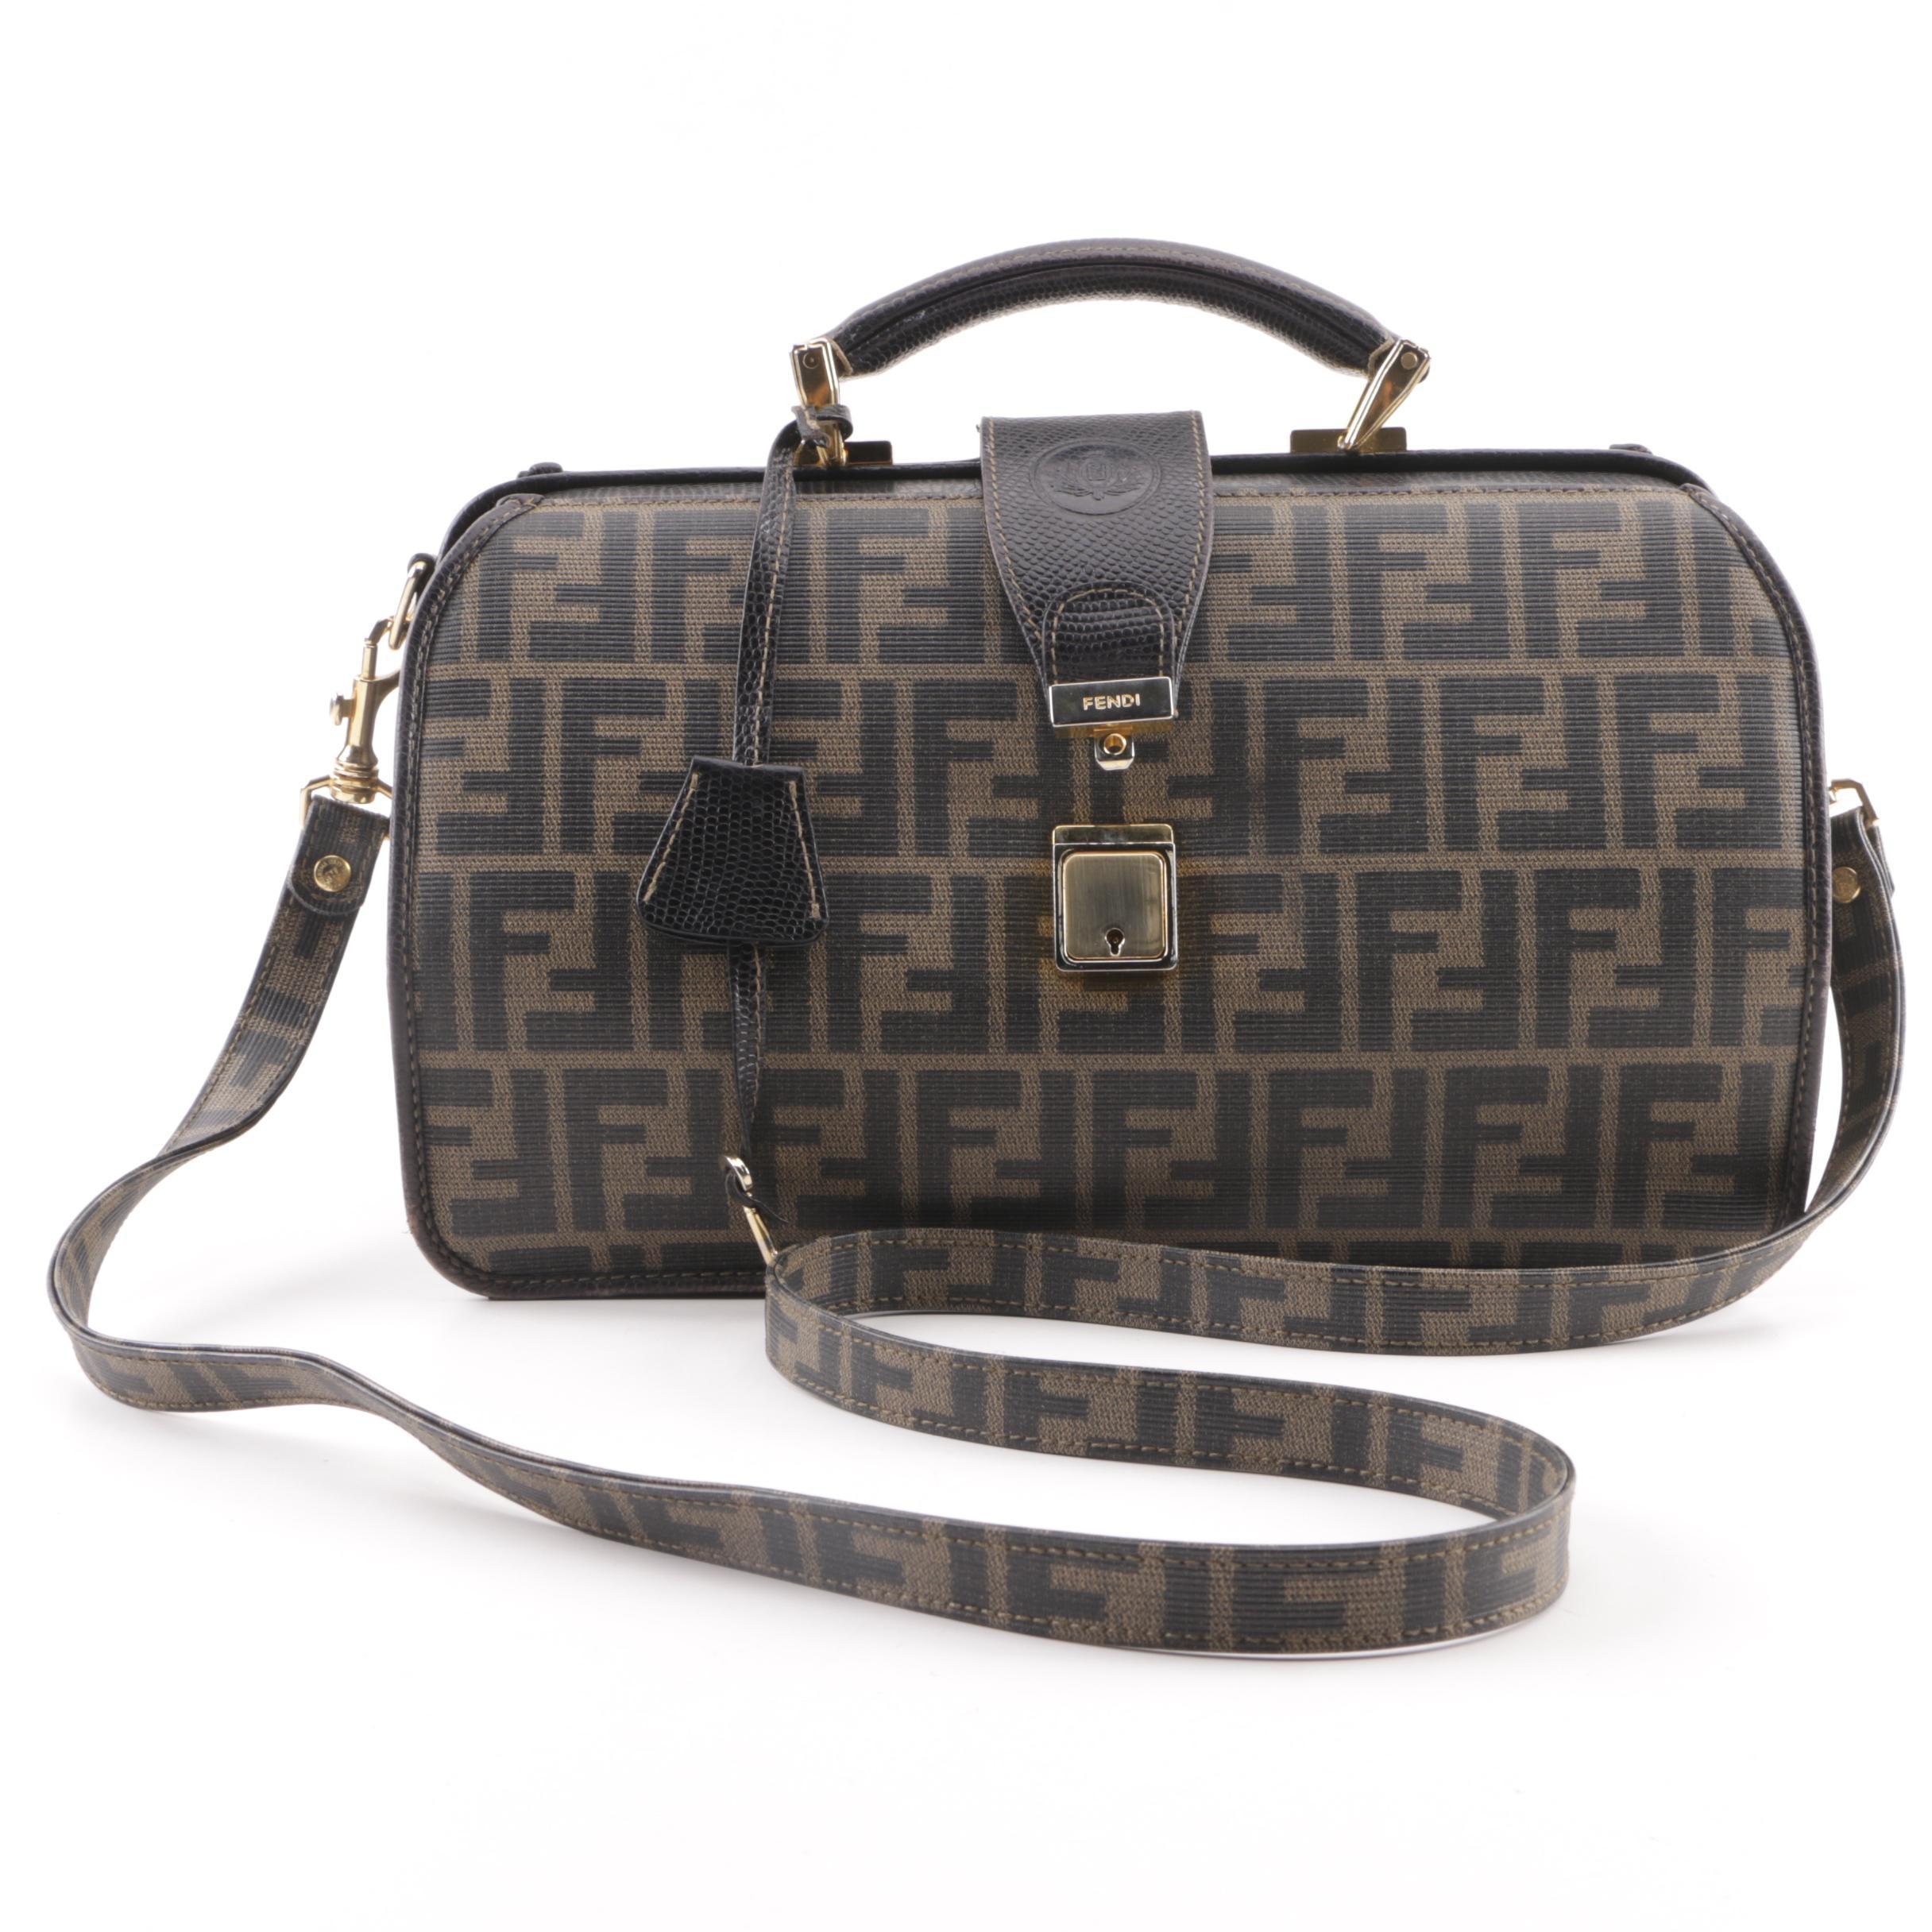 Fendi Monogram Canvas Neiman Marcus Exclusive Doctor Bag